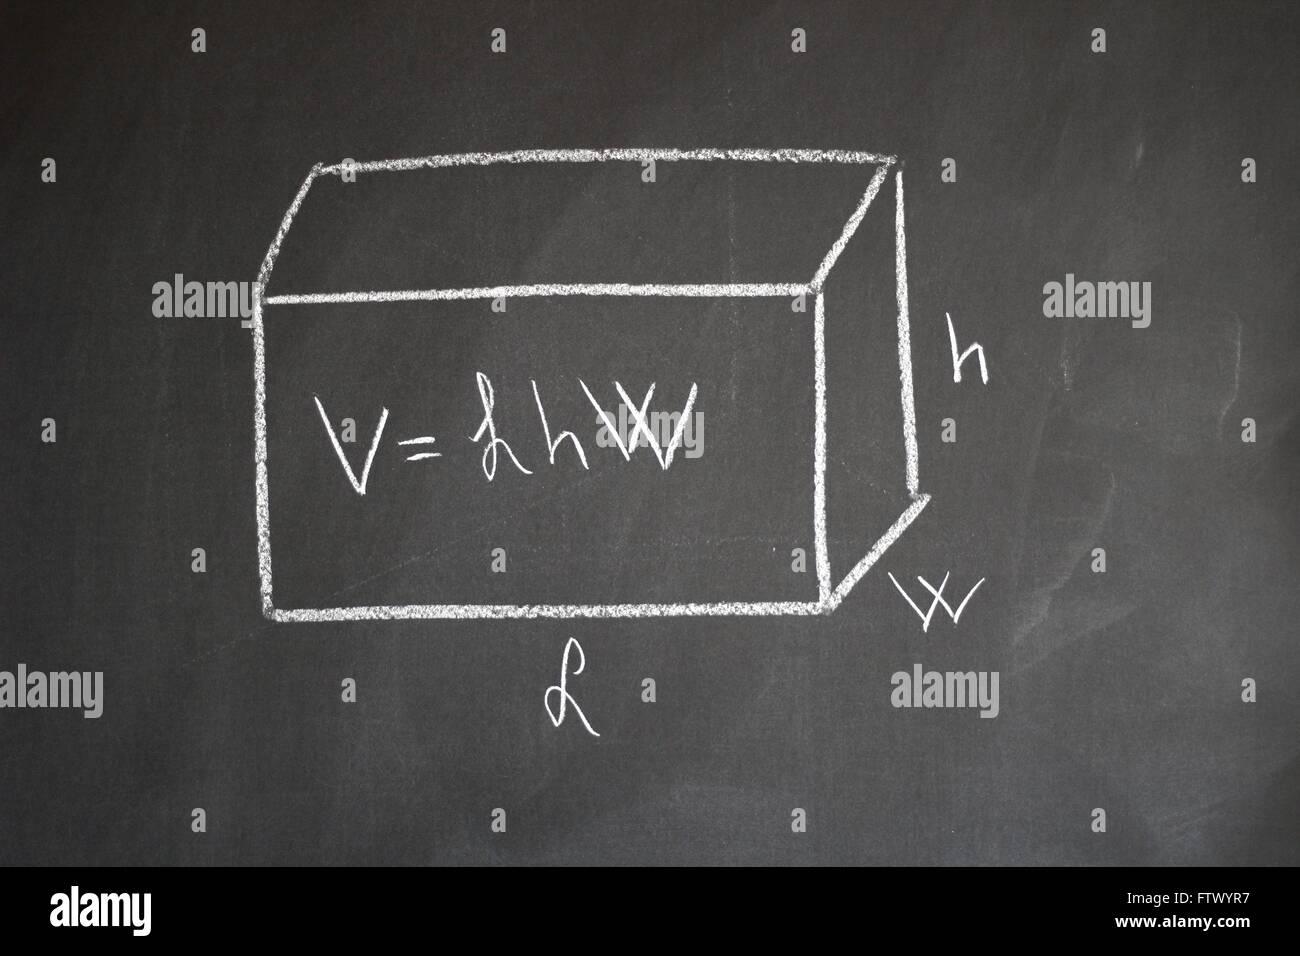 Dorable Studyisland C0m Crest - Math Worksheets - modopol.com